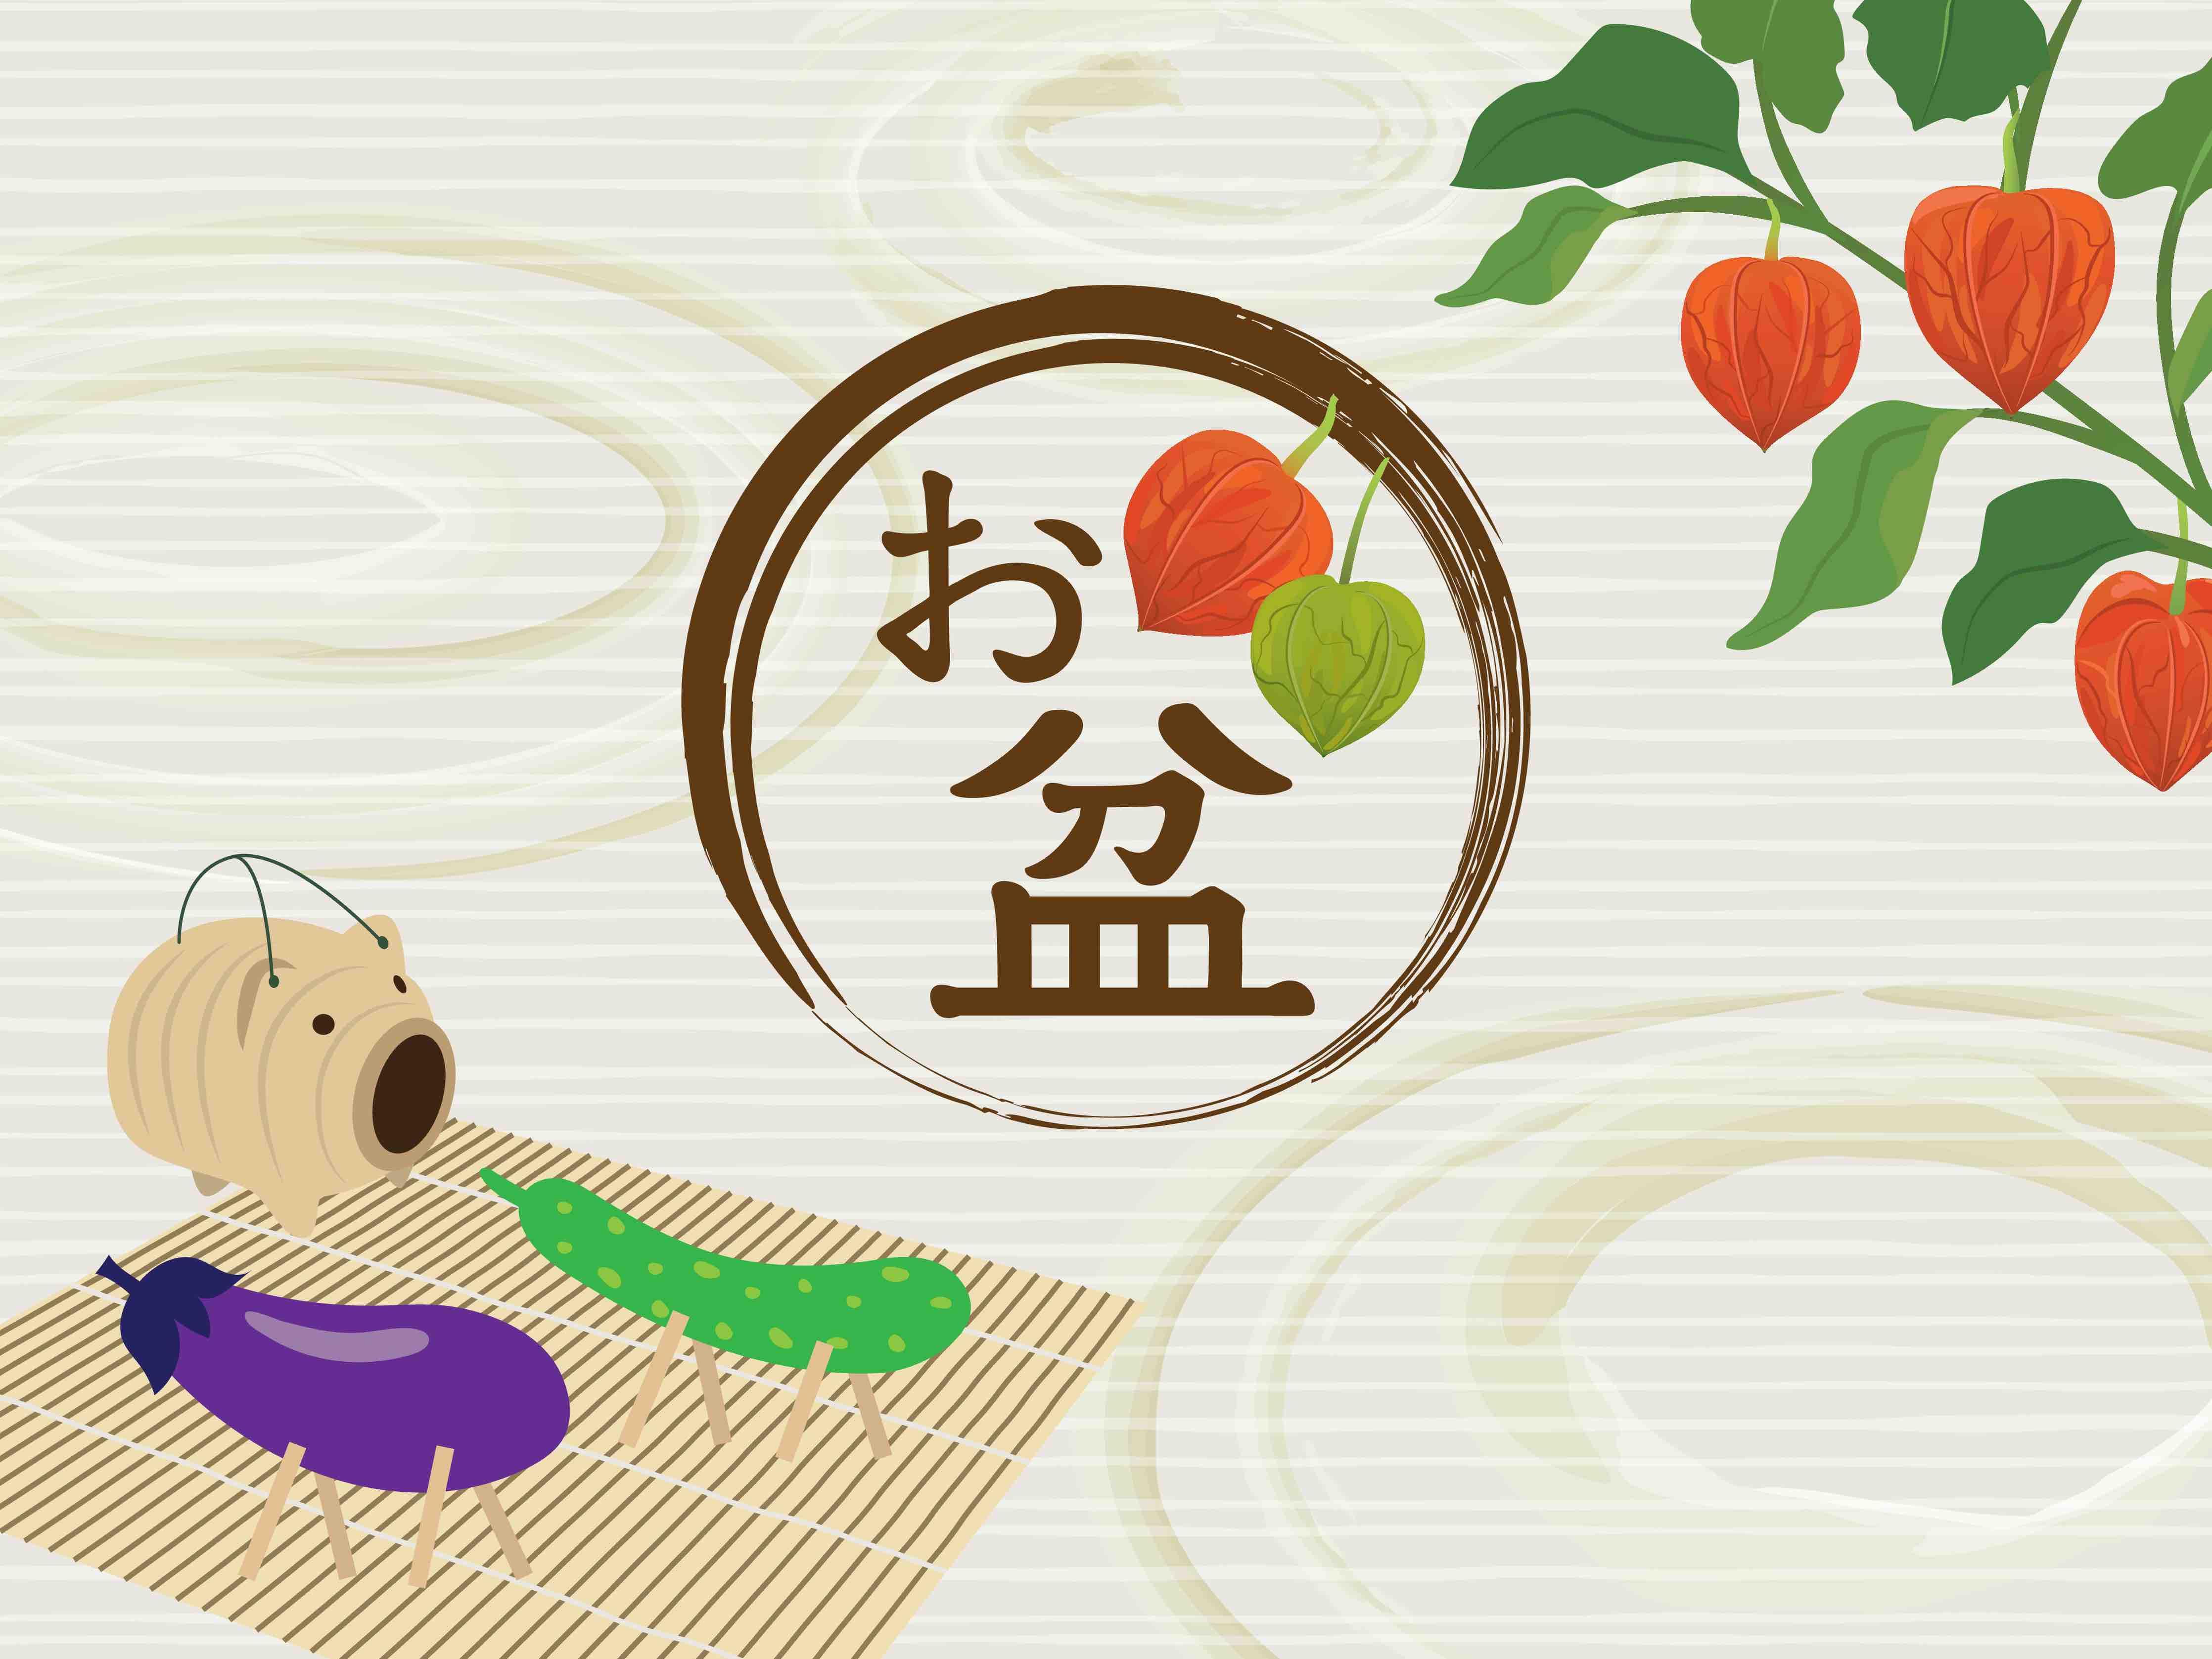 ओबोन/お盆